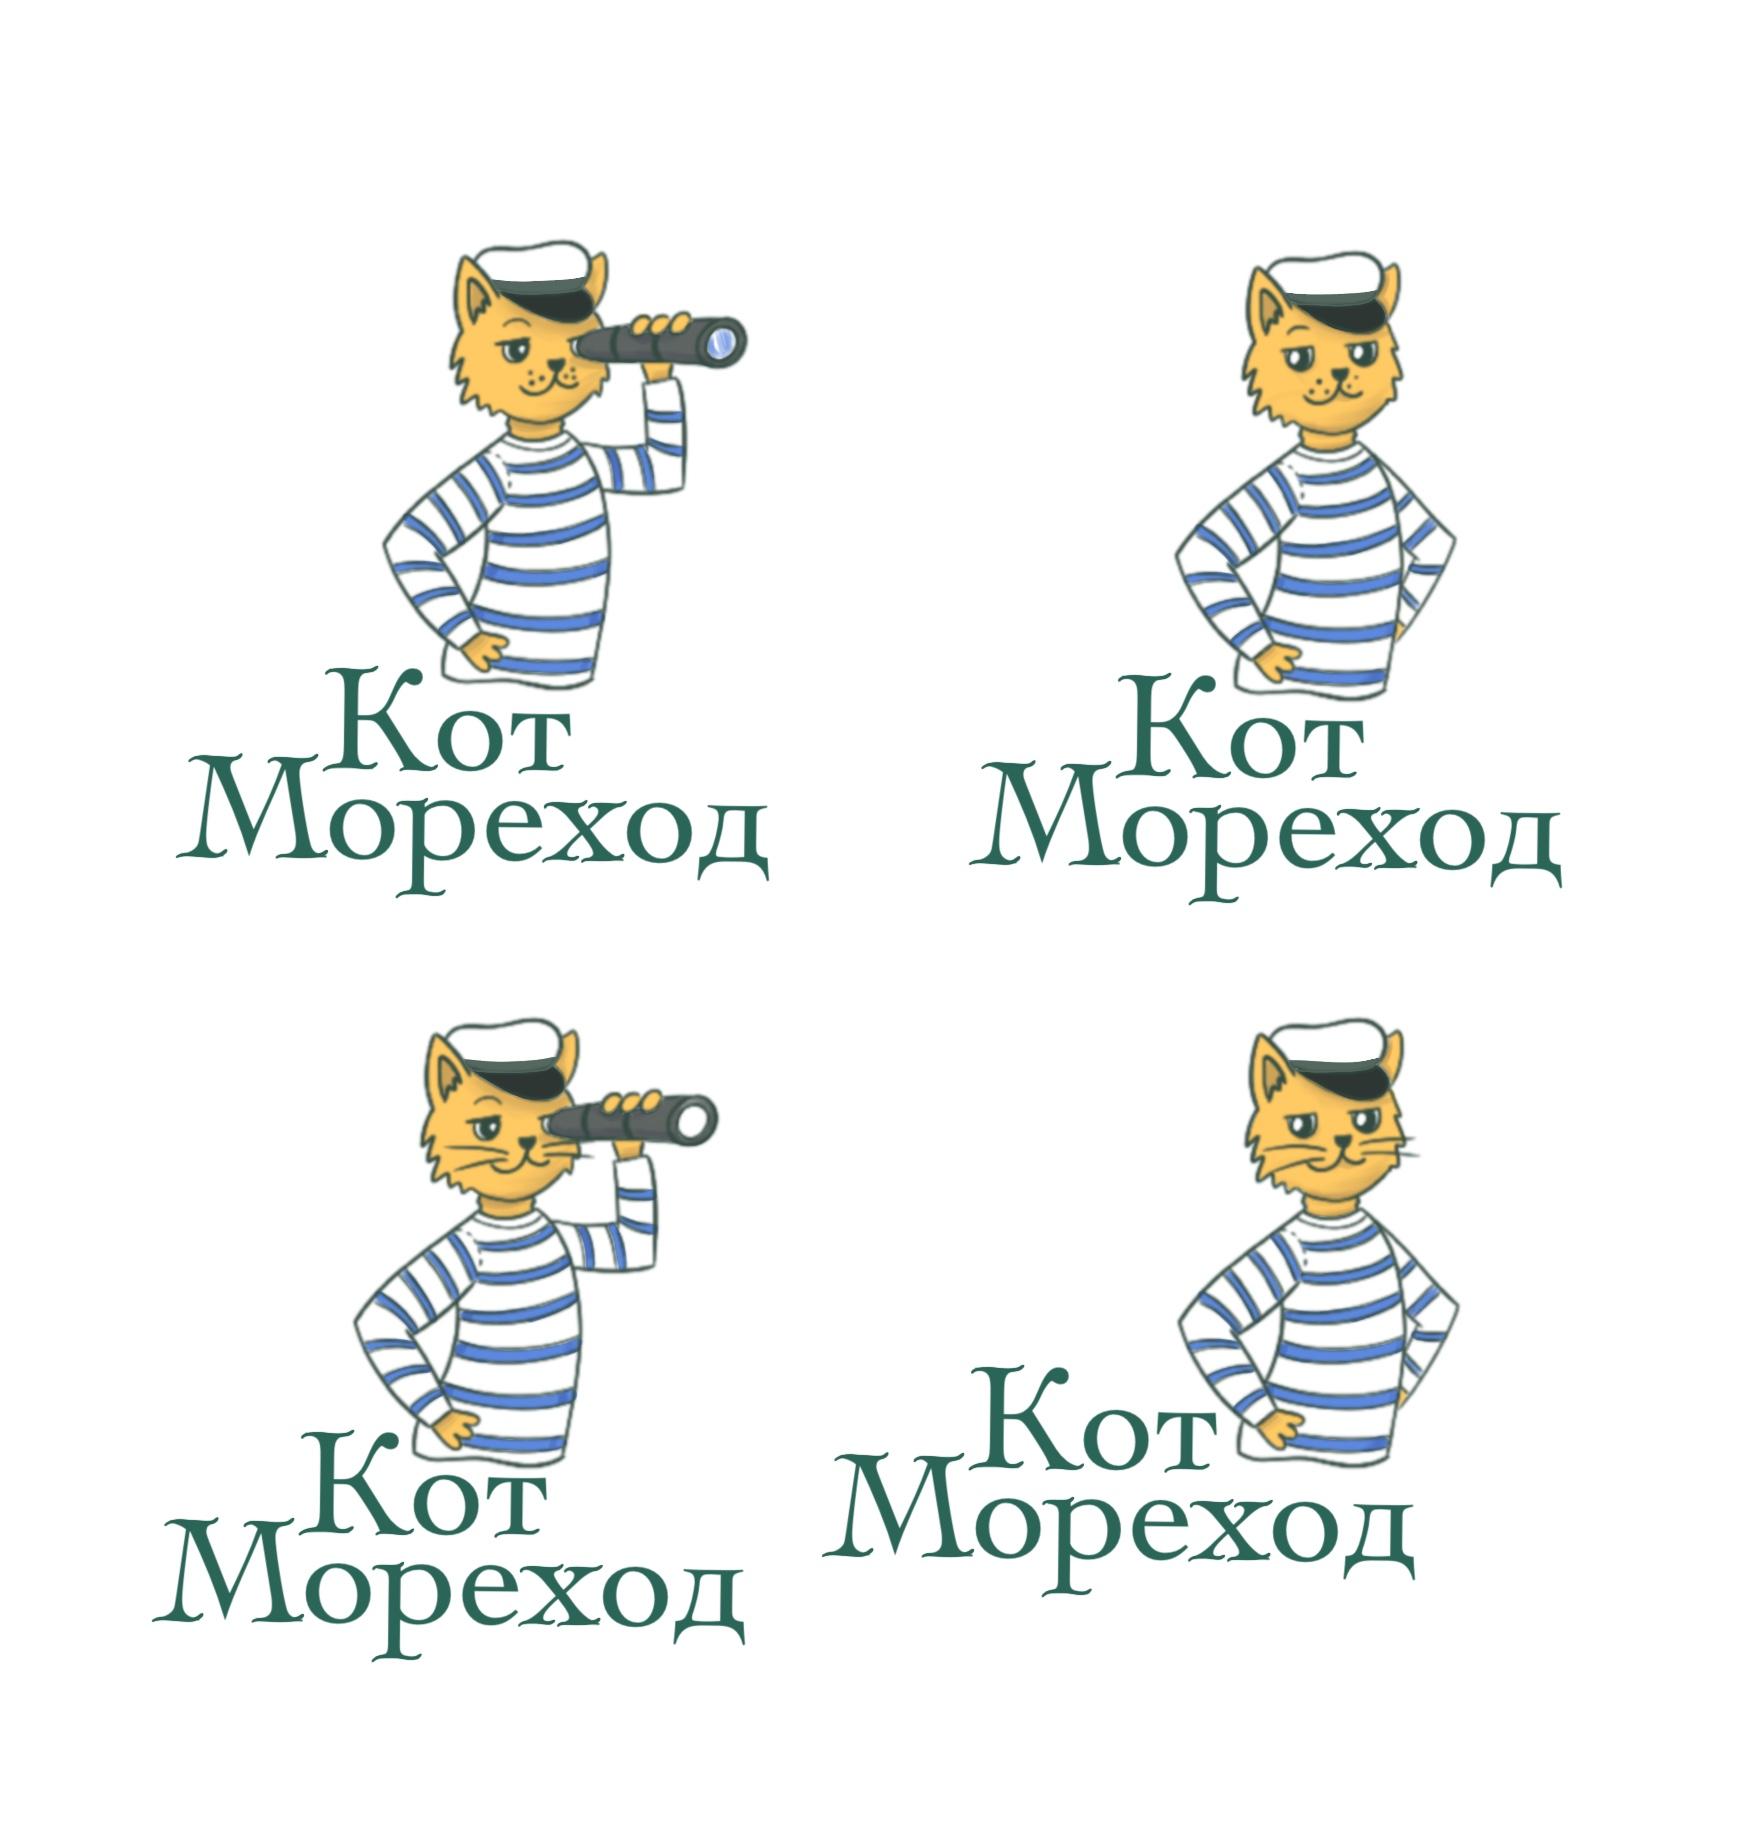 Разработка логотипа для детского центра фото f_1315cffd104d79e5.jpg